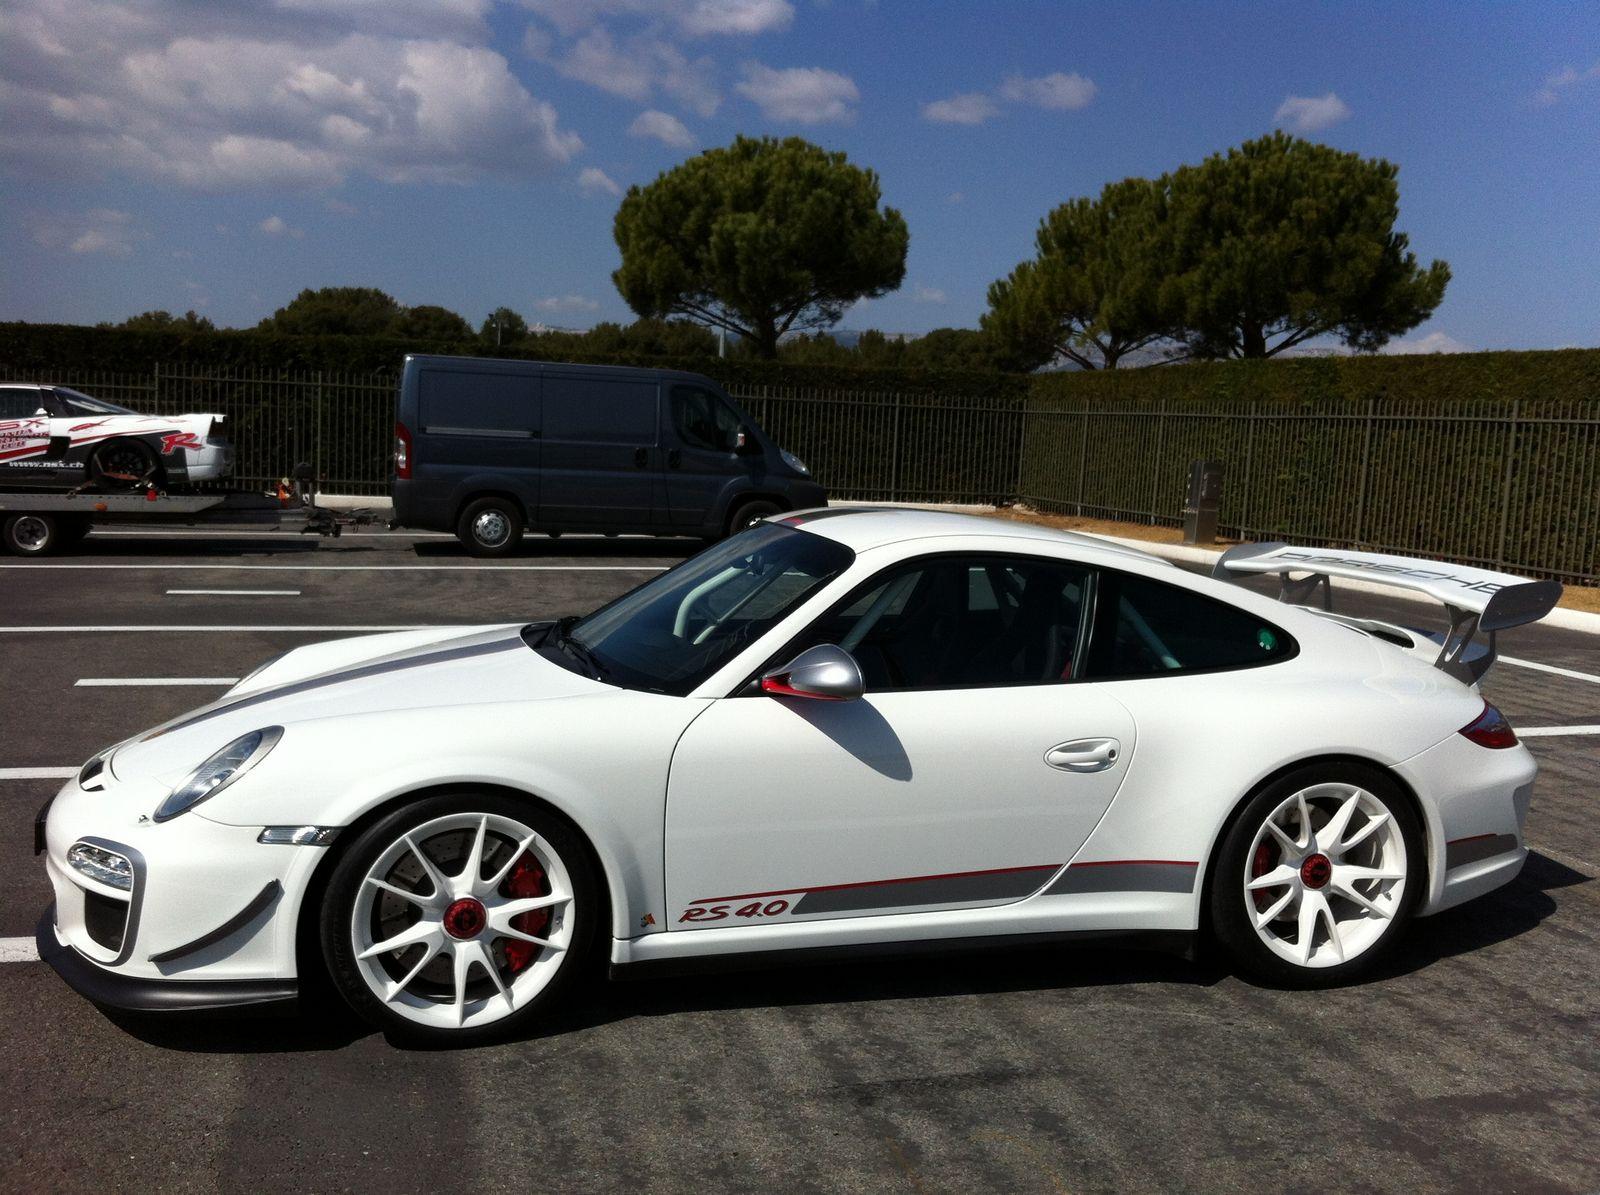 Porsche 911 gt3 rs 4.0 (Обзор) Технические характеристики